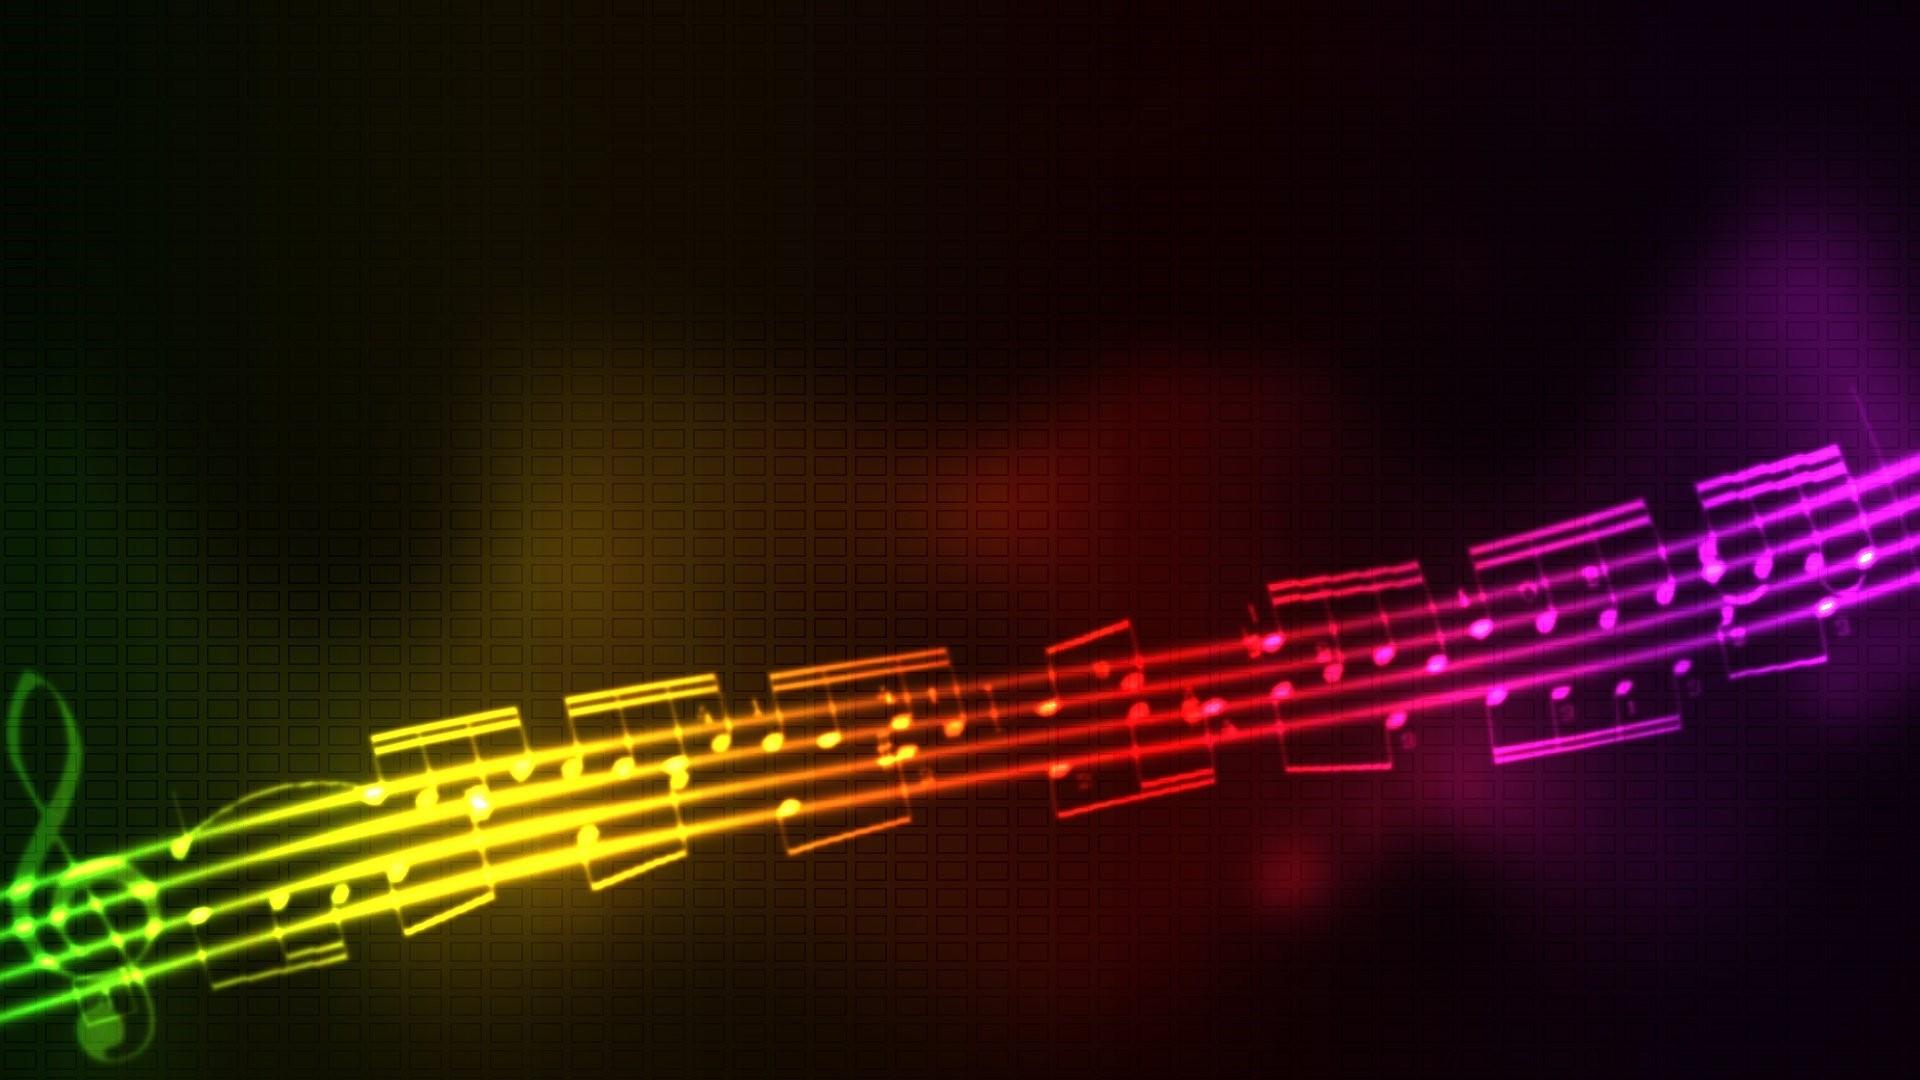 Cute Music a Wallpaper